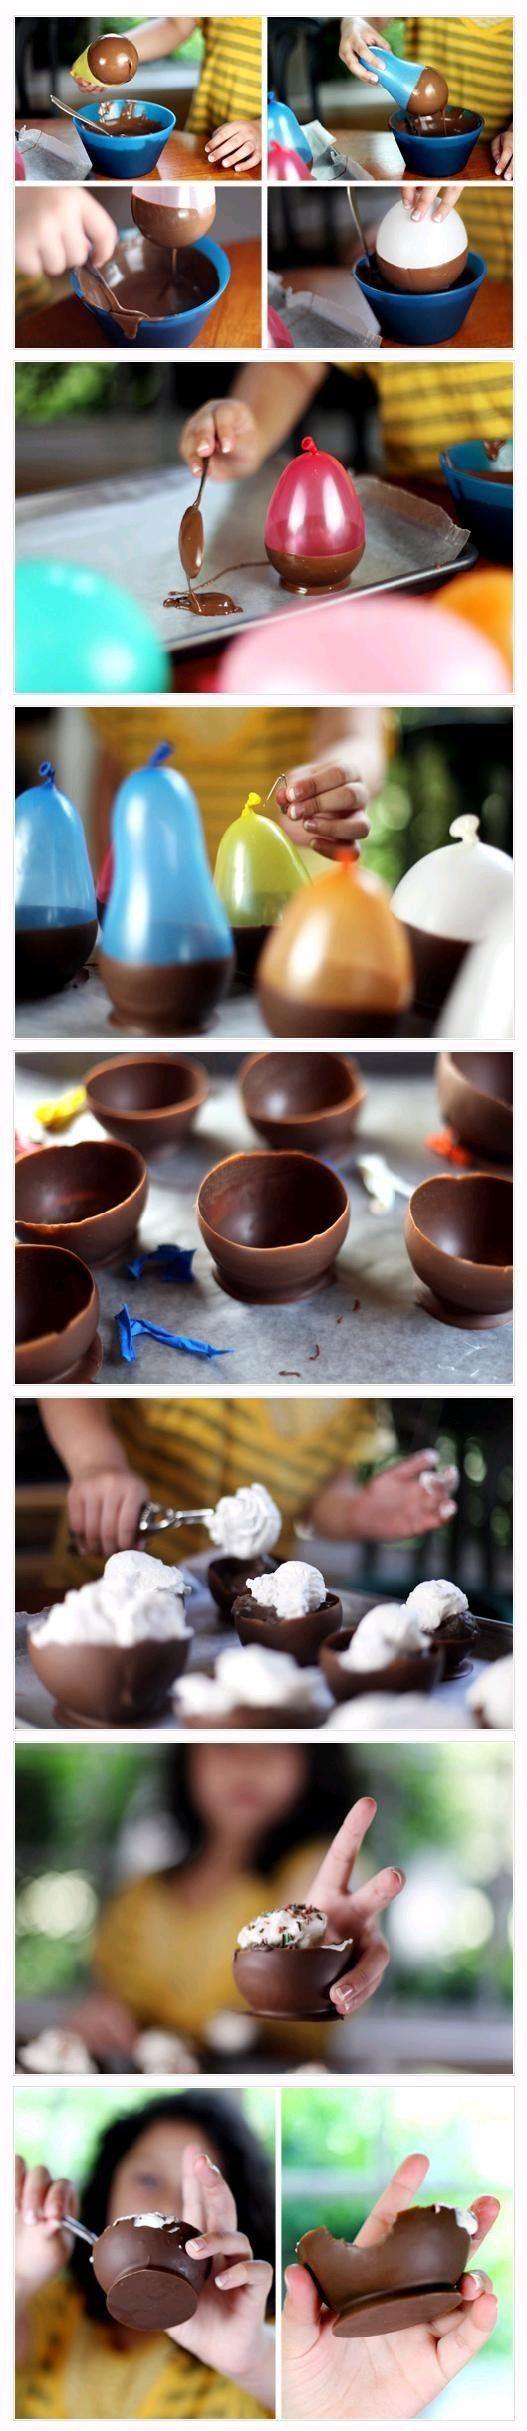 That is a cool yummy chocolate ice cream bowl. Sooo cute!